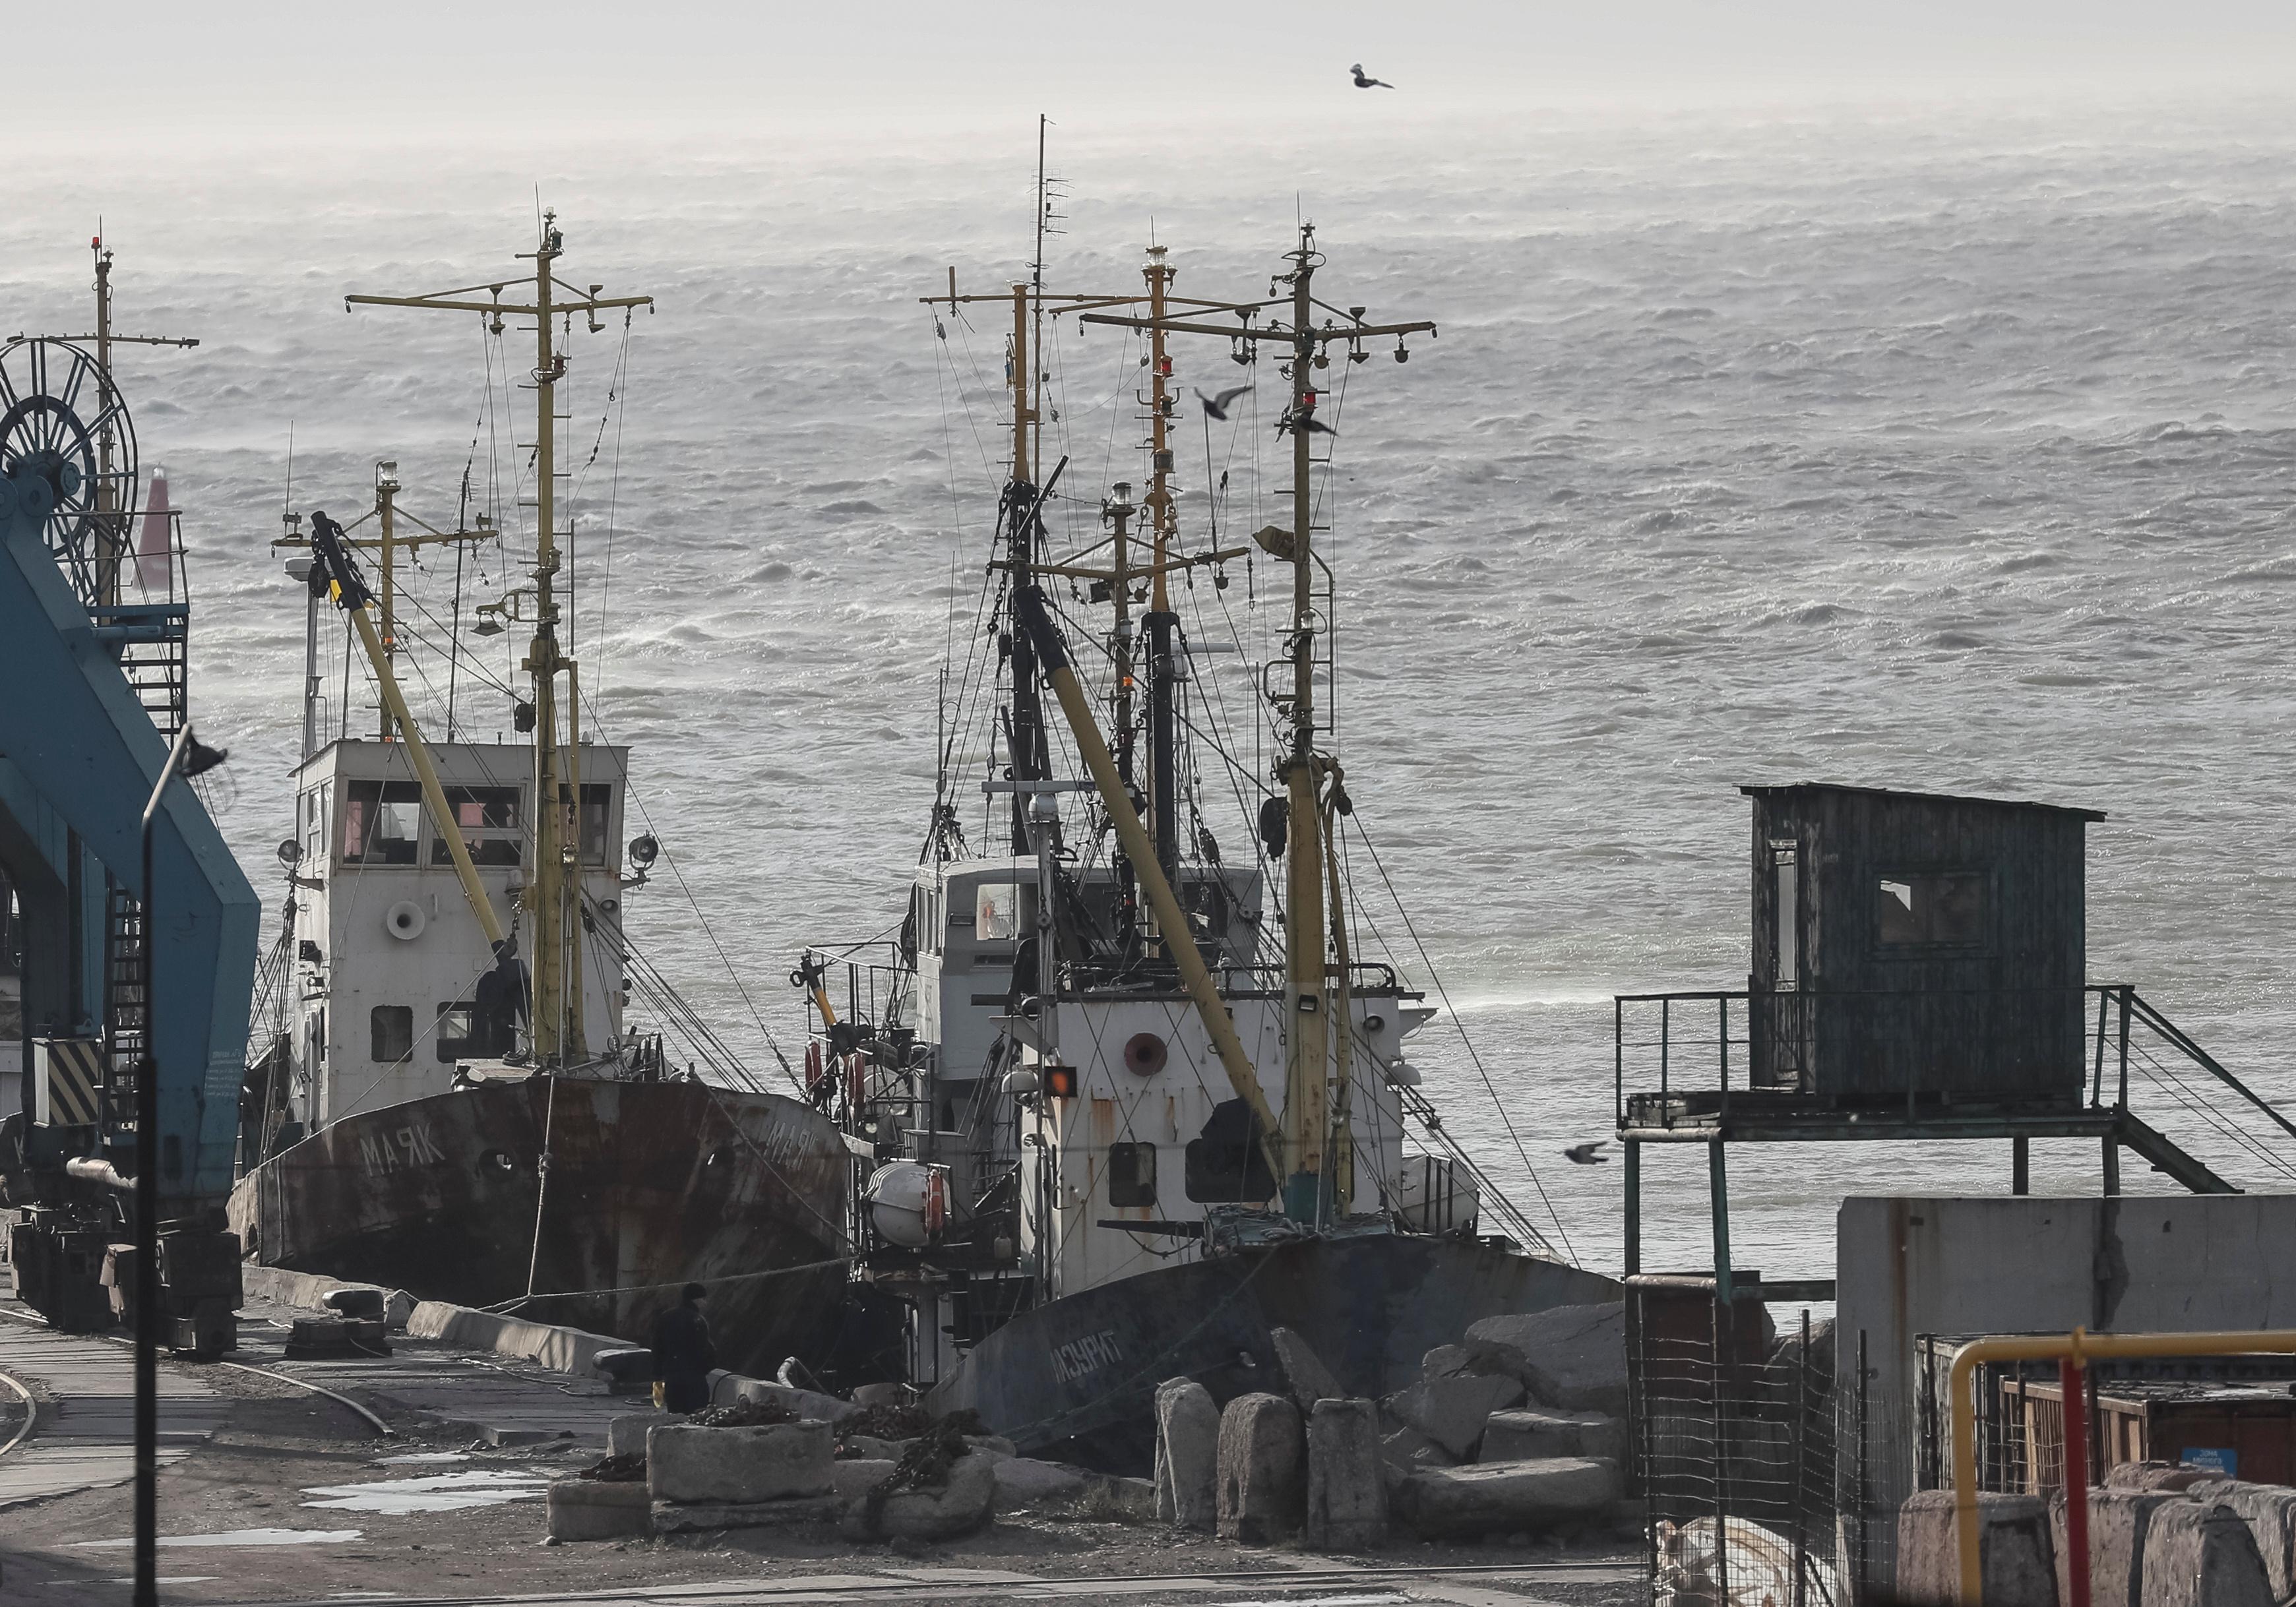 Ships are seen in the Azov Sea port of Berdyansk, Ukraine November 30, 2018. REUTERS/Gleb Garanich